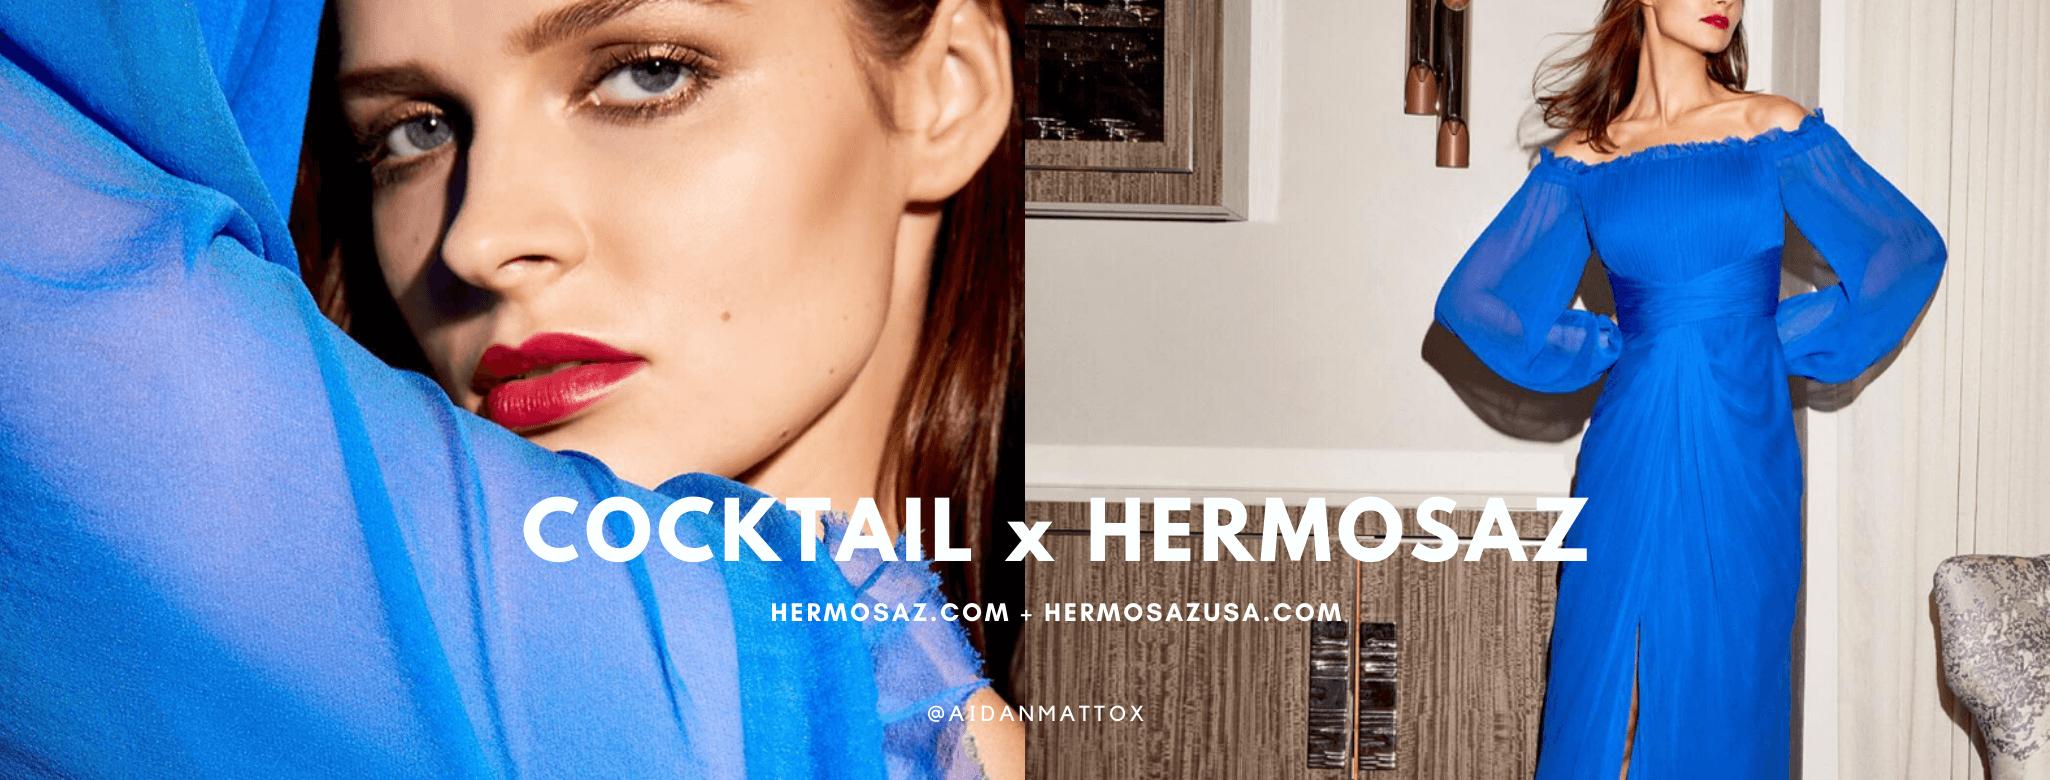 Cocktail x Hermosaz